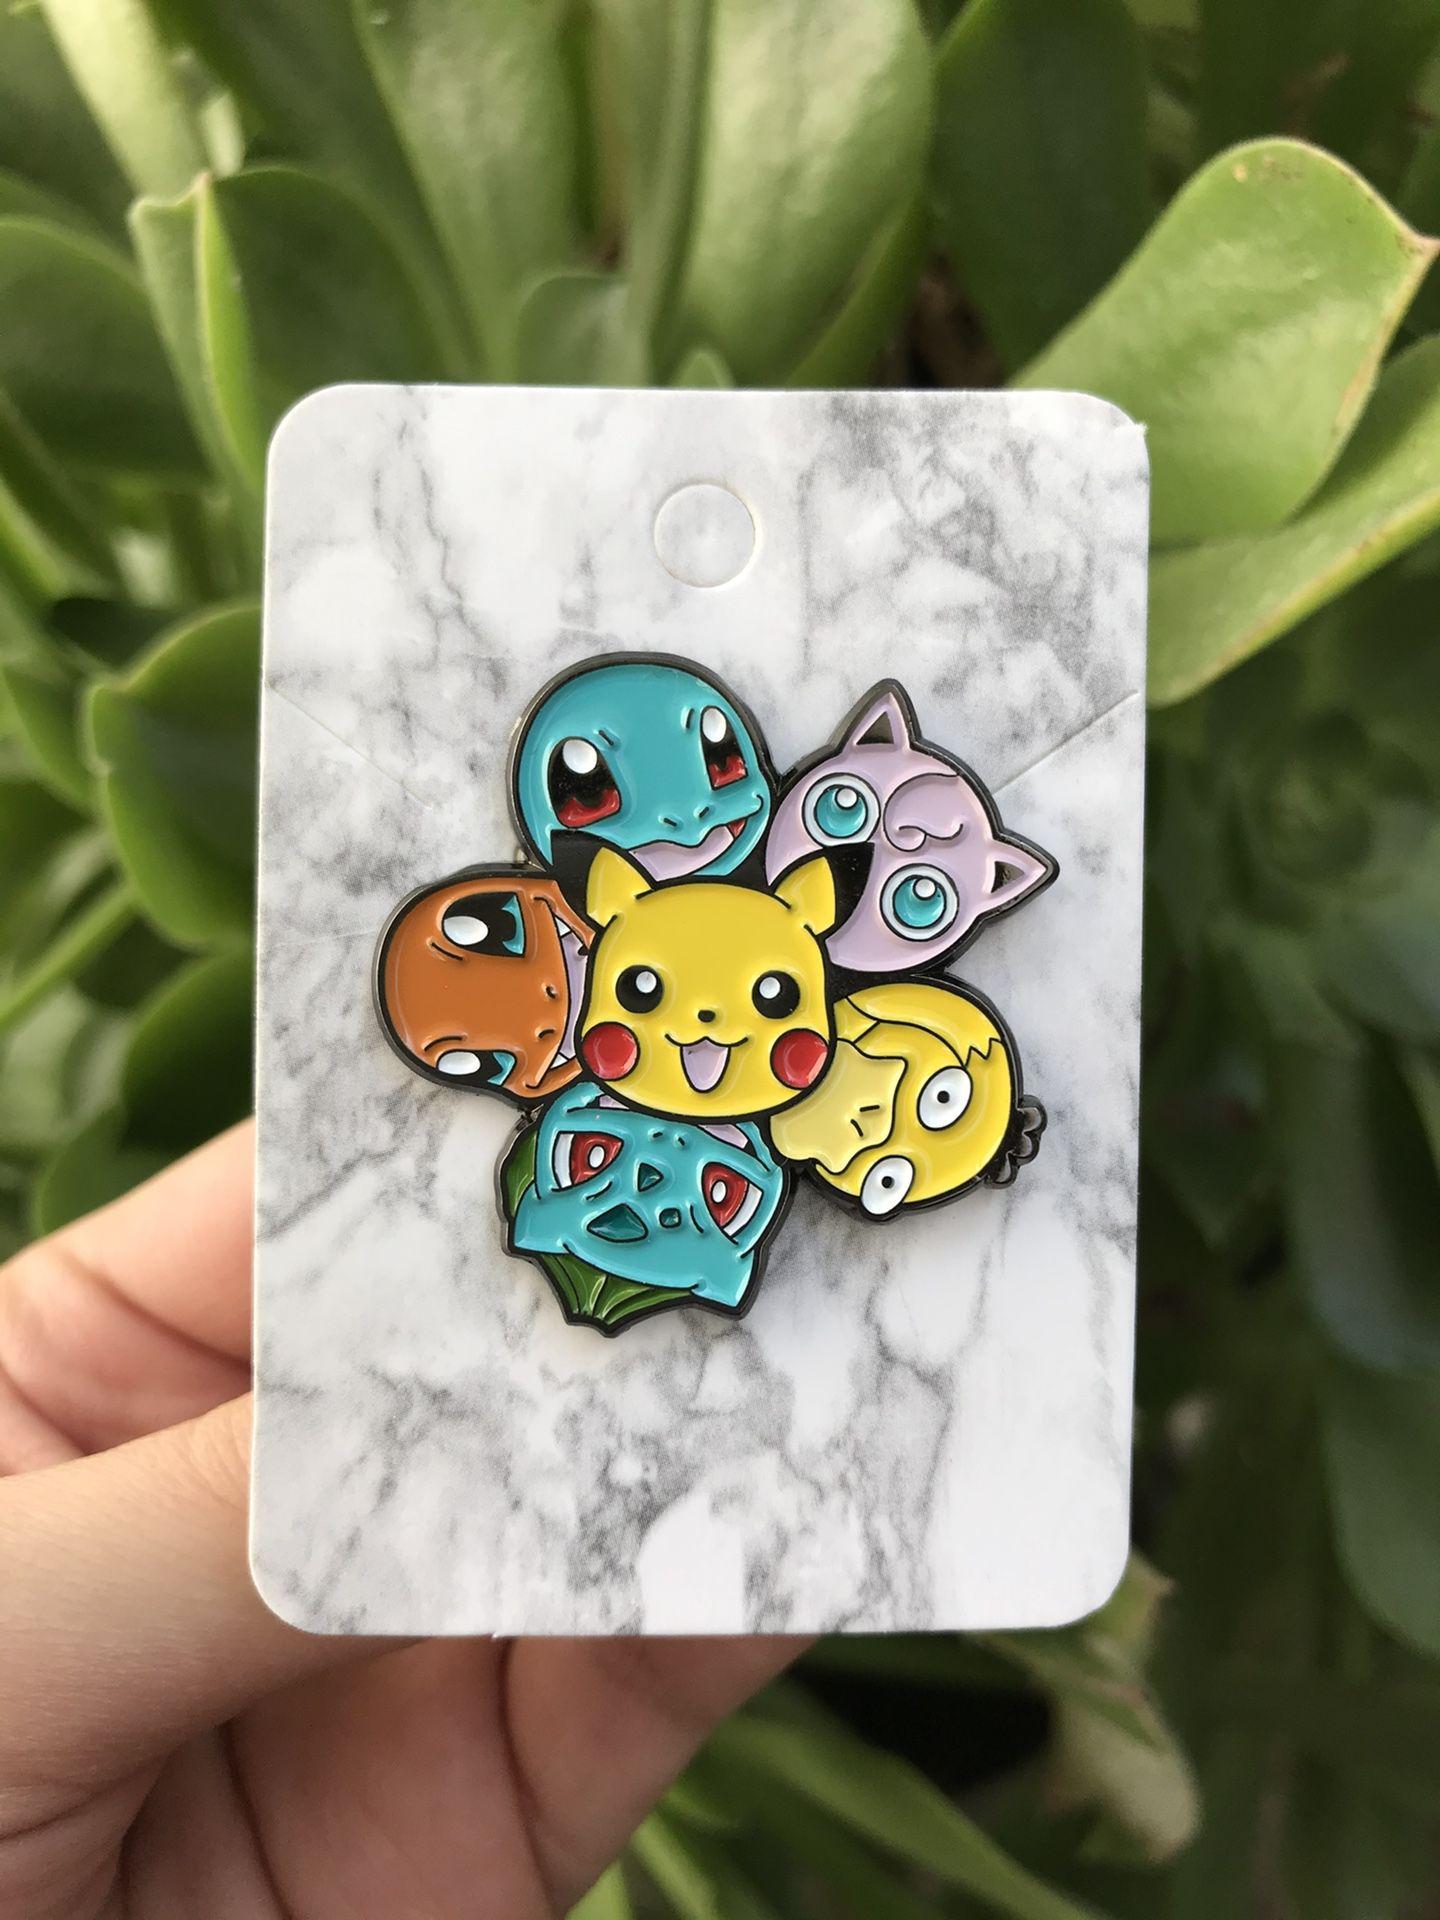 Pikachu X Bulbasaur X Charmander X Psyduck X Squirtle X Jiggleypuff Pokemon Pin